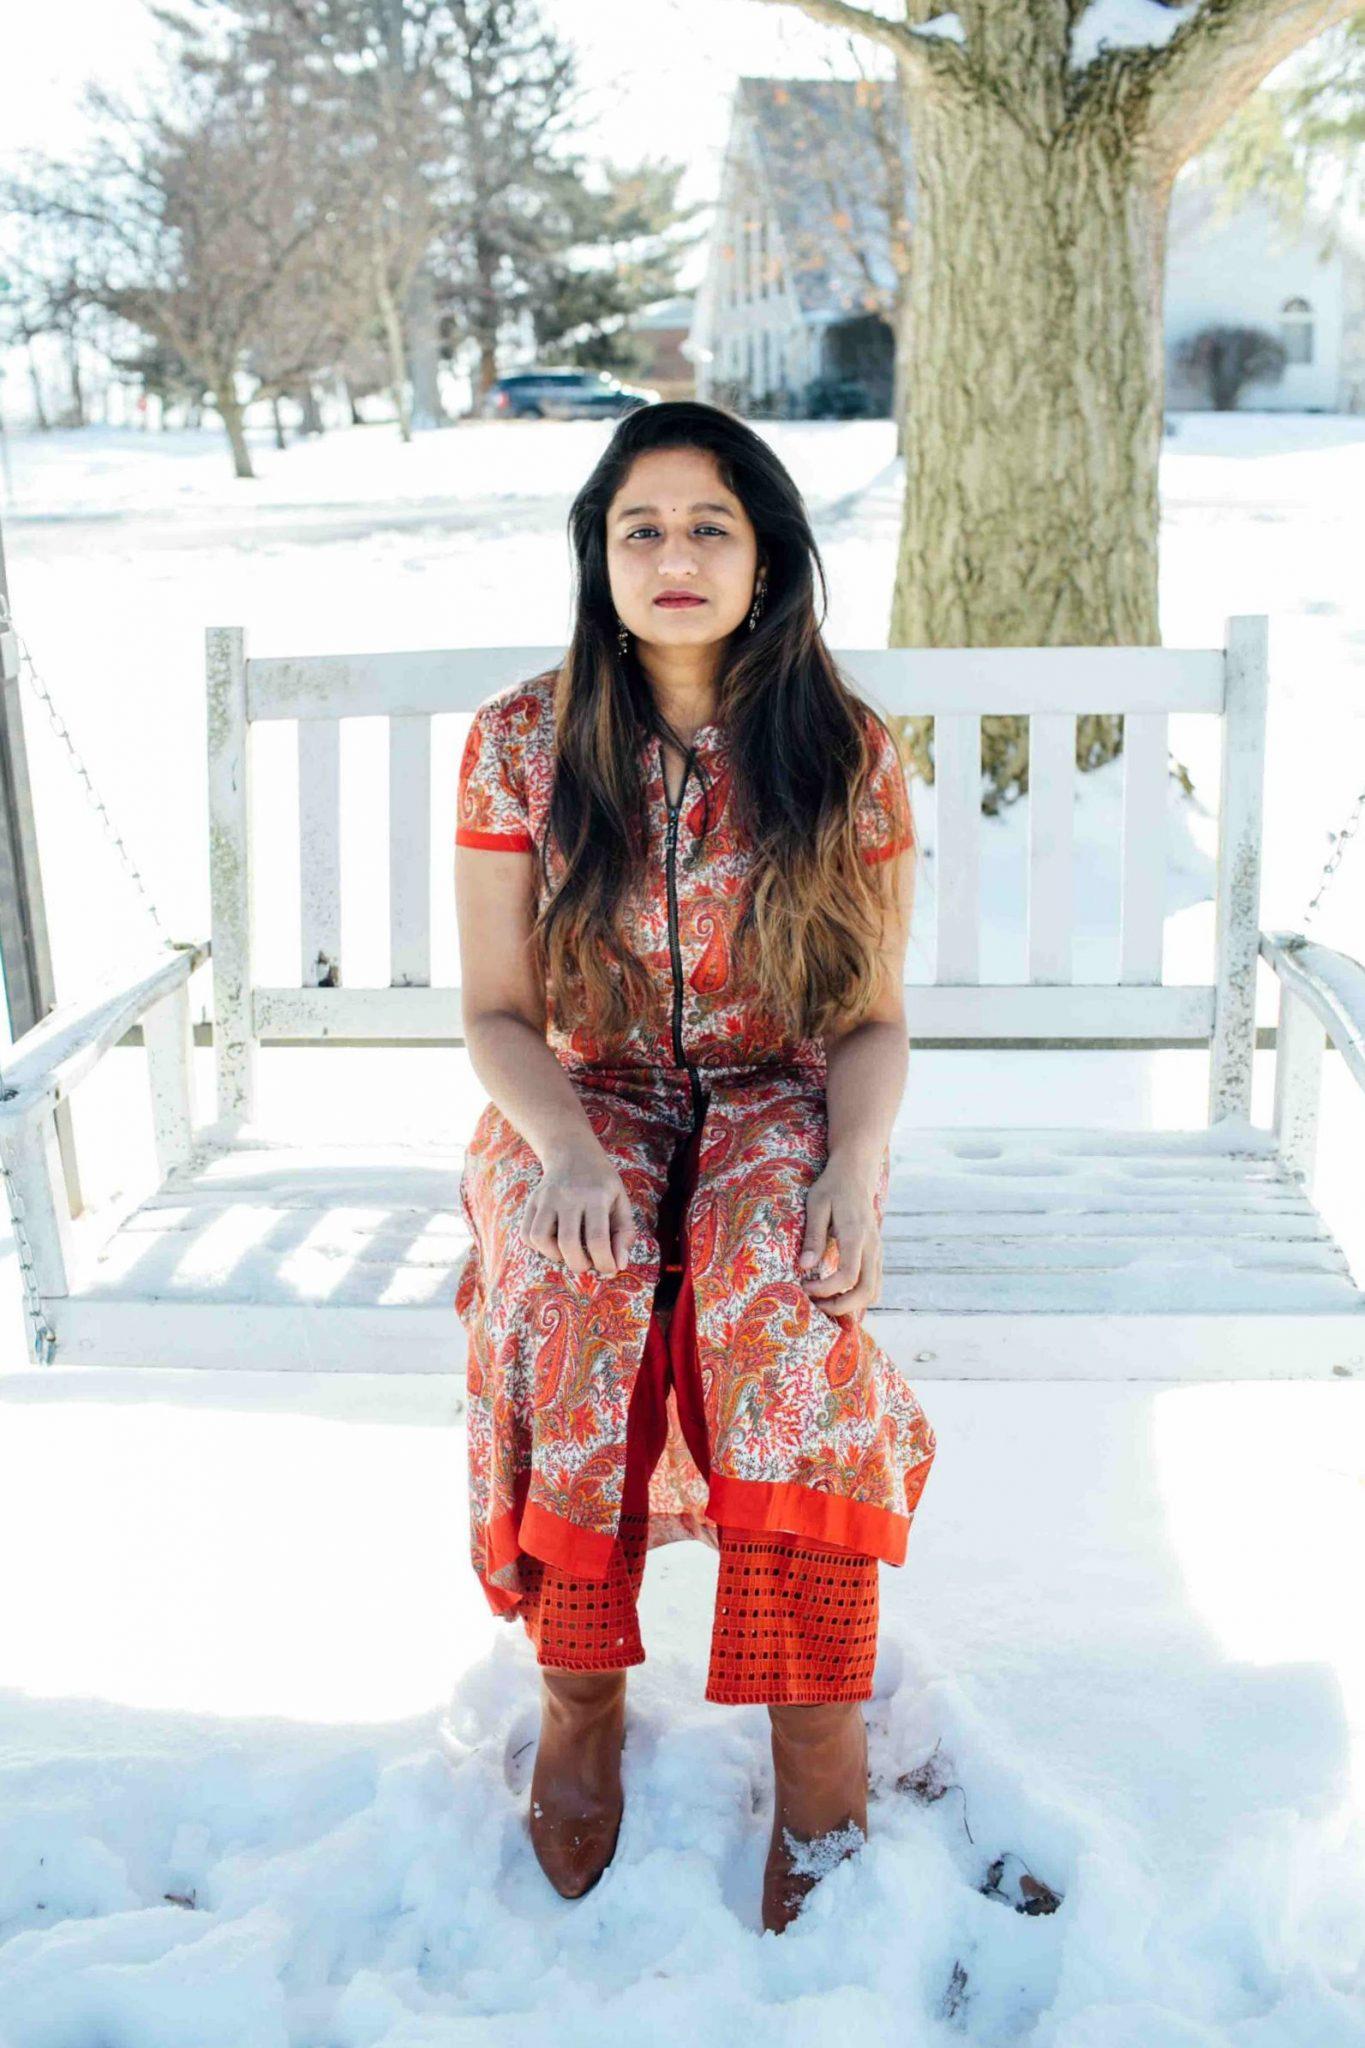 lifestyle blog dreaming loud sharing Makar Sankranti or pongal Outfit 2